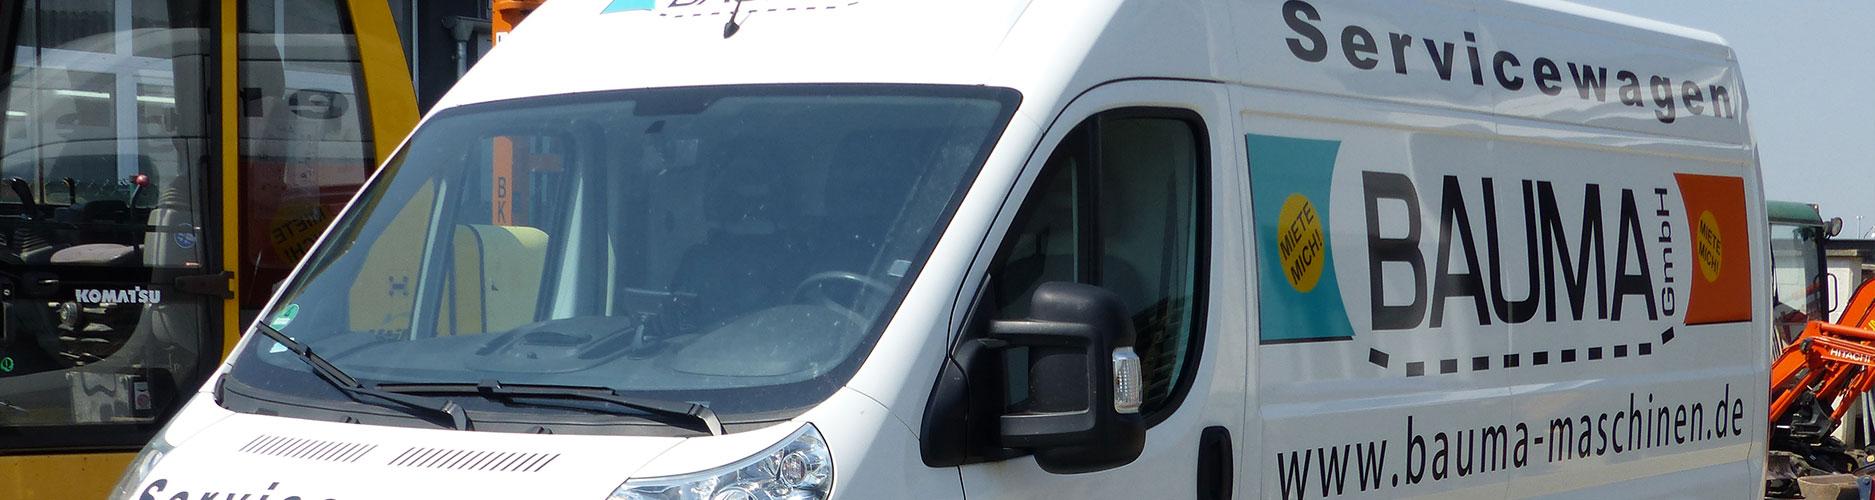 Bauma LKW - Transportmittel